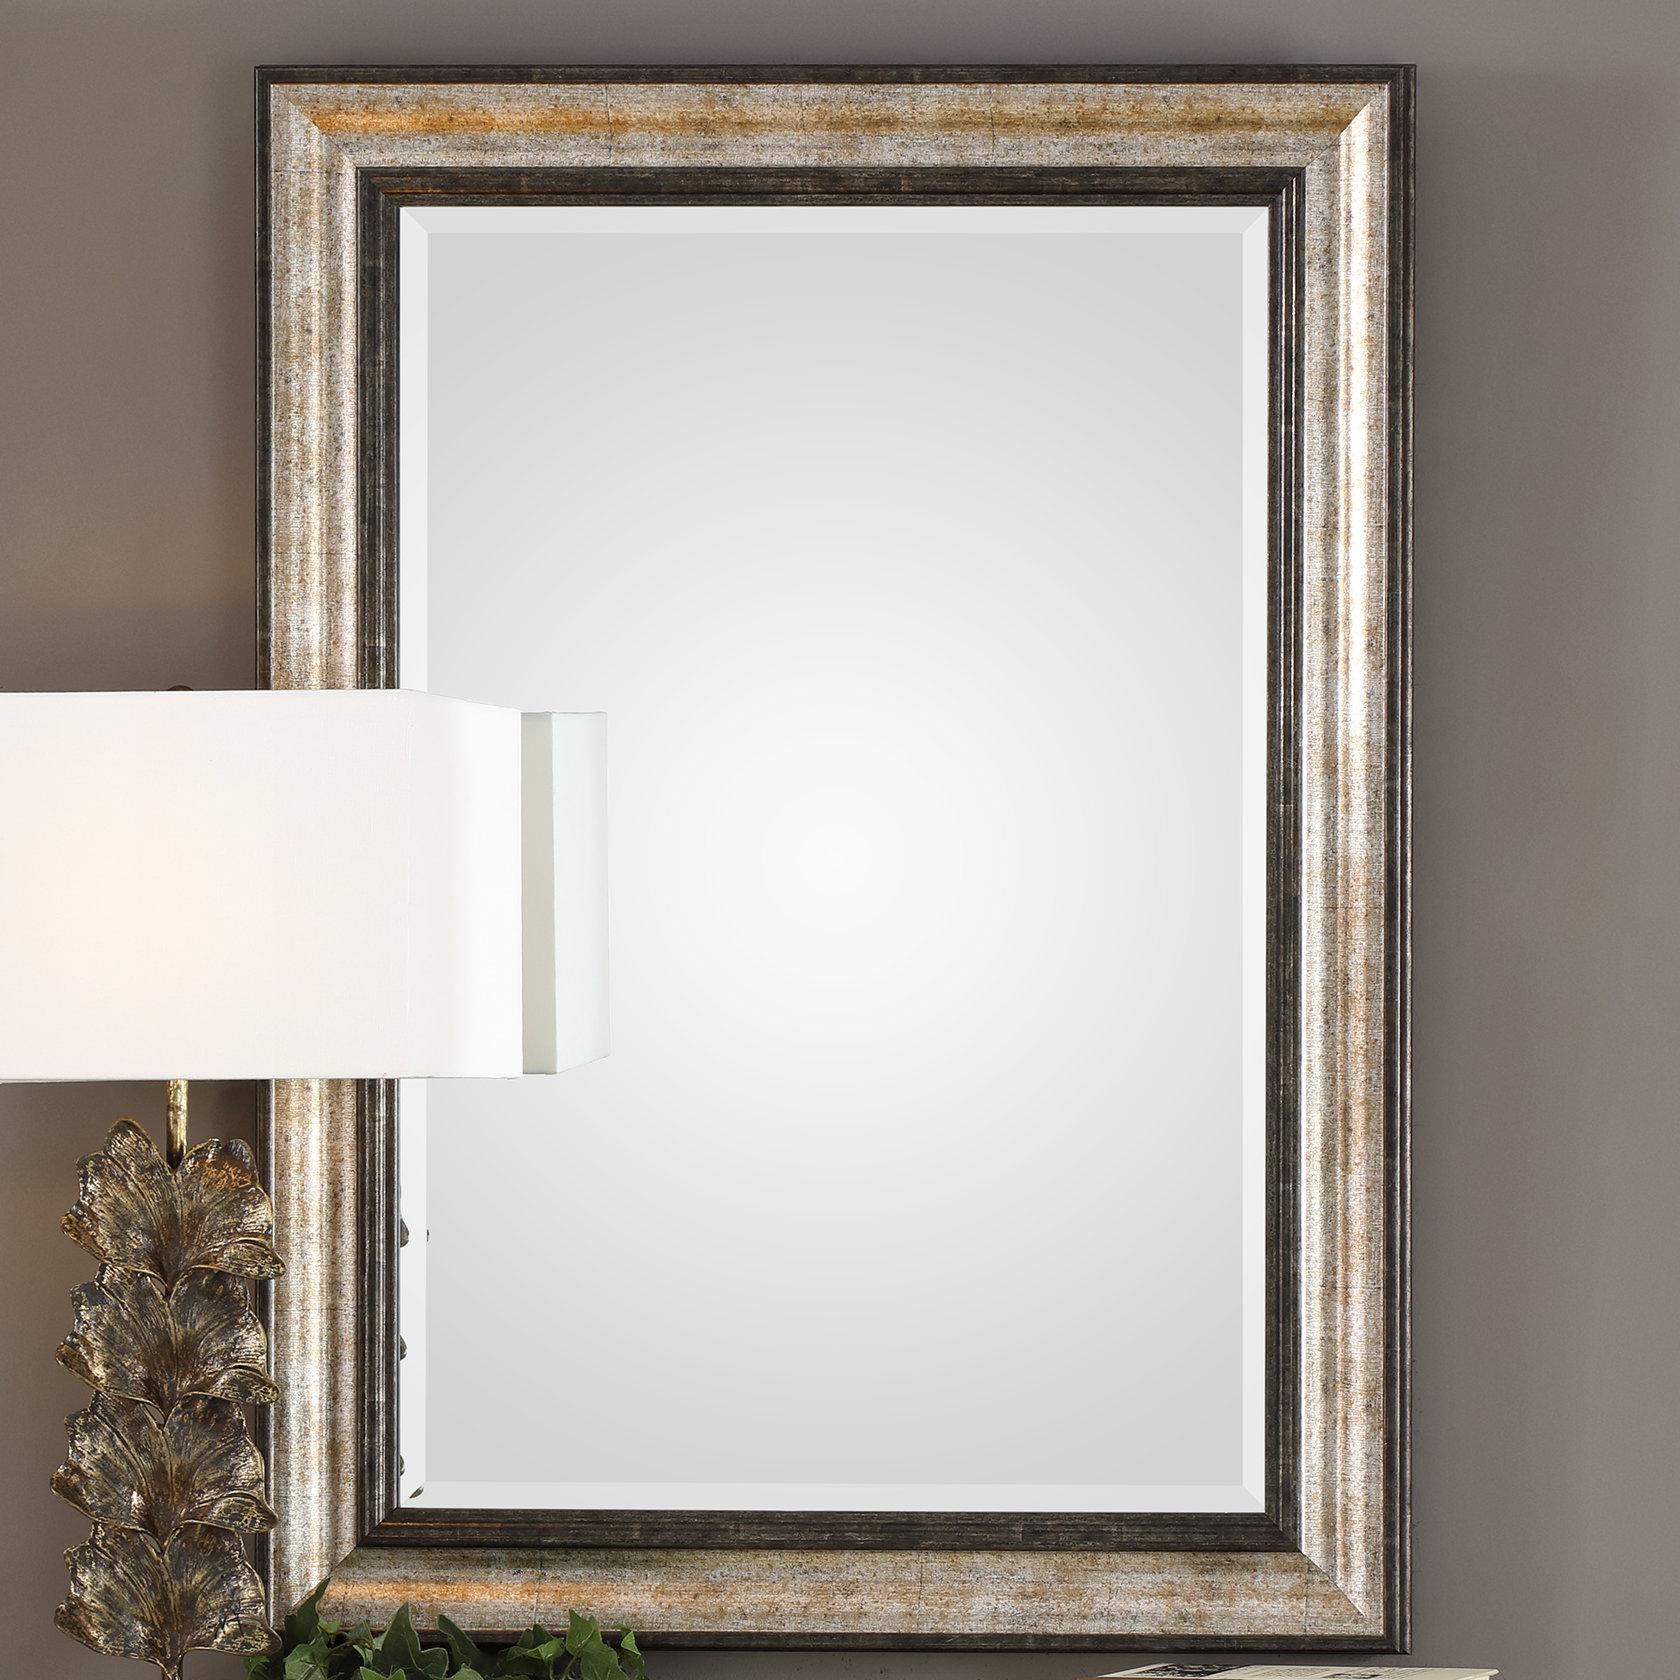 Jevon Accent Mirror Pertaining To Bartolo Accent Mirrors (Image 9 of 20)